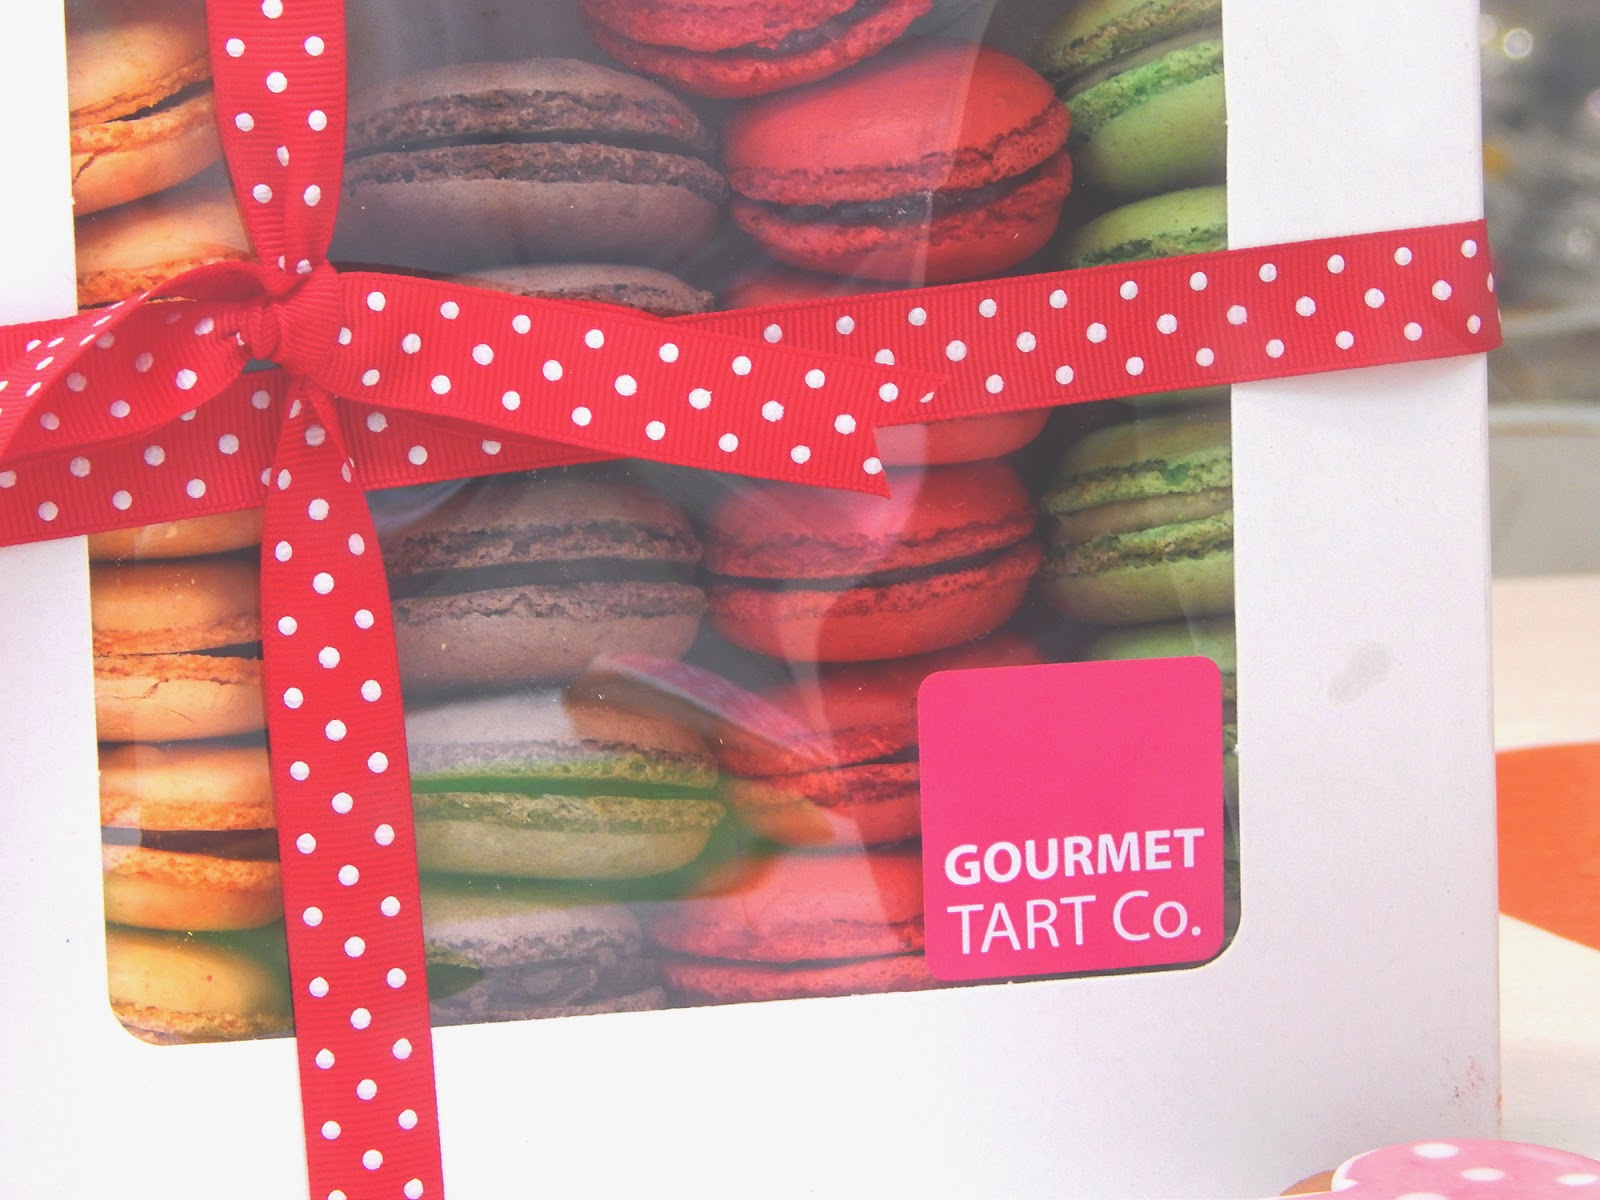 Gourmet Tart Co. Galway Macaroons